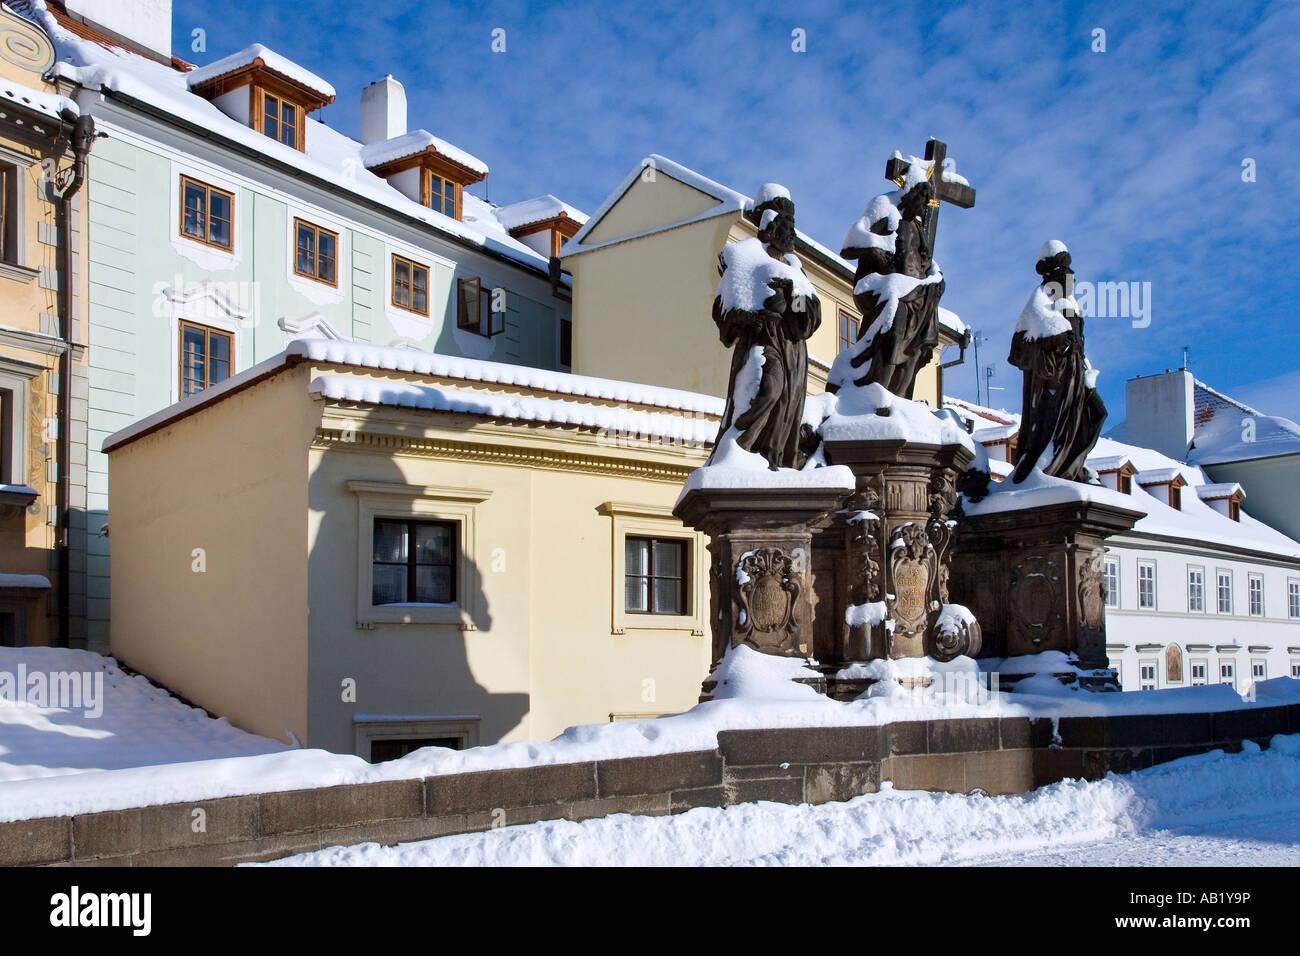 Karluv most sv Kosma Damian a Salvator Mala Strana Praha UNESCO Ceska republika - Stock Image